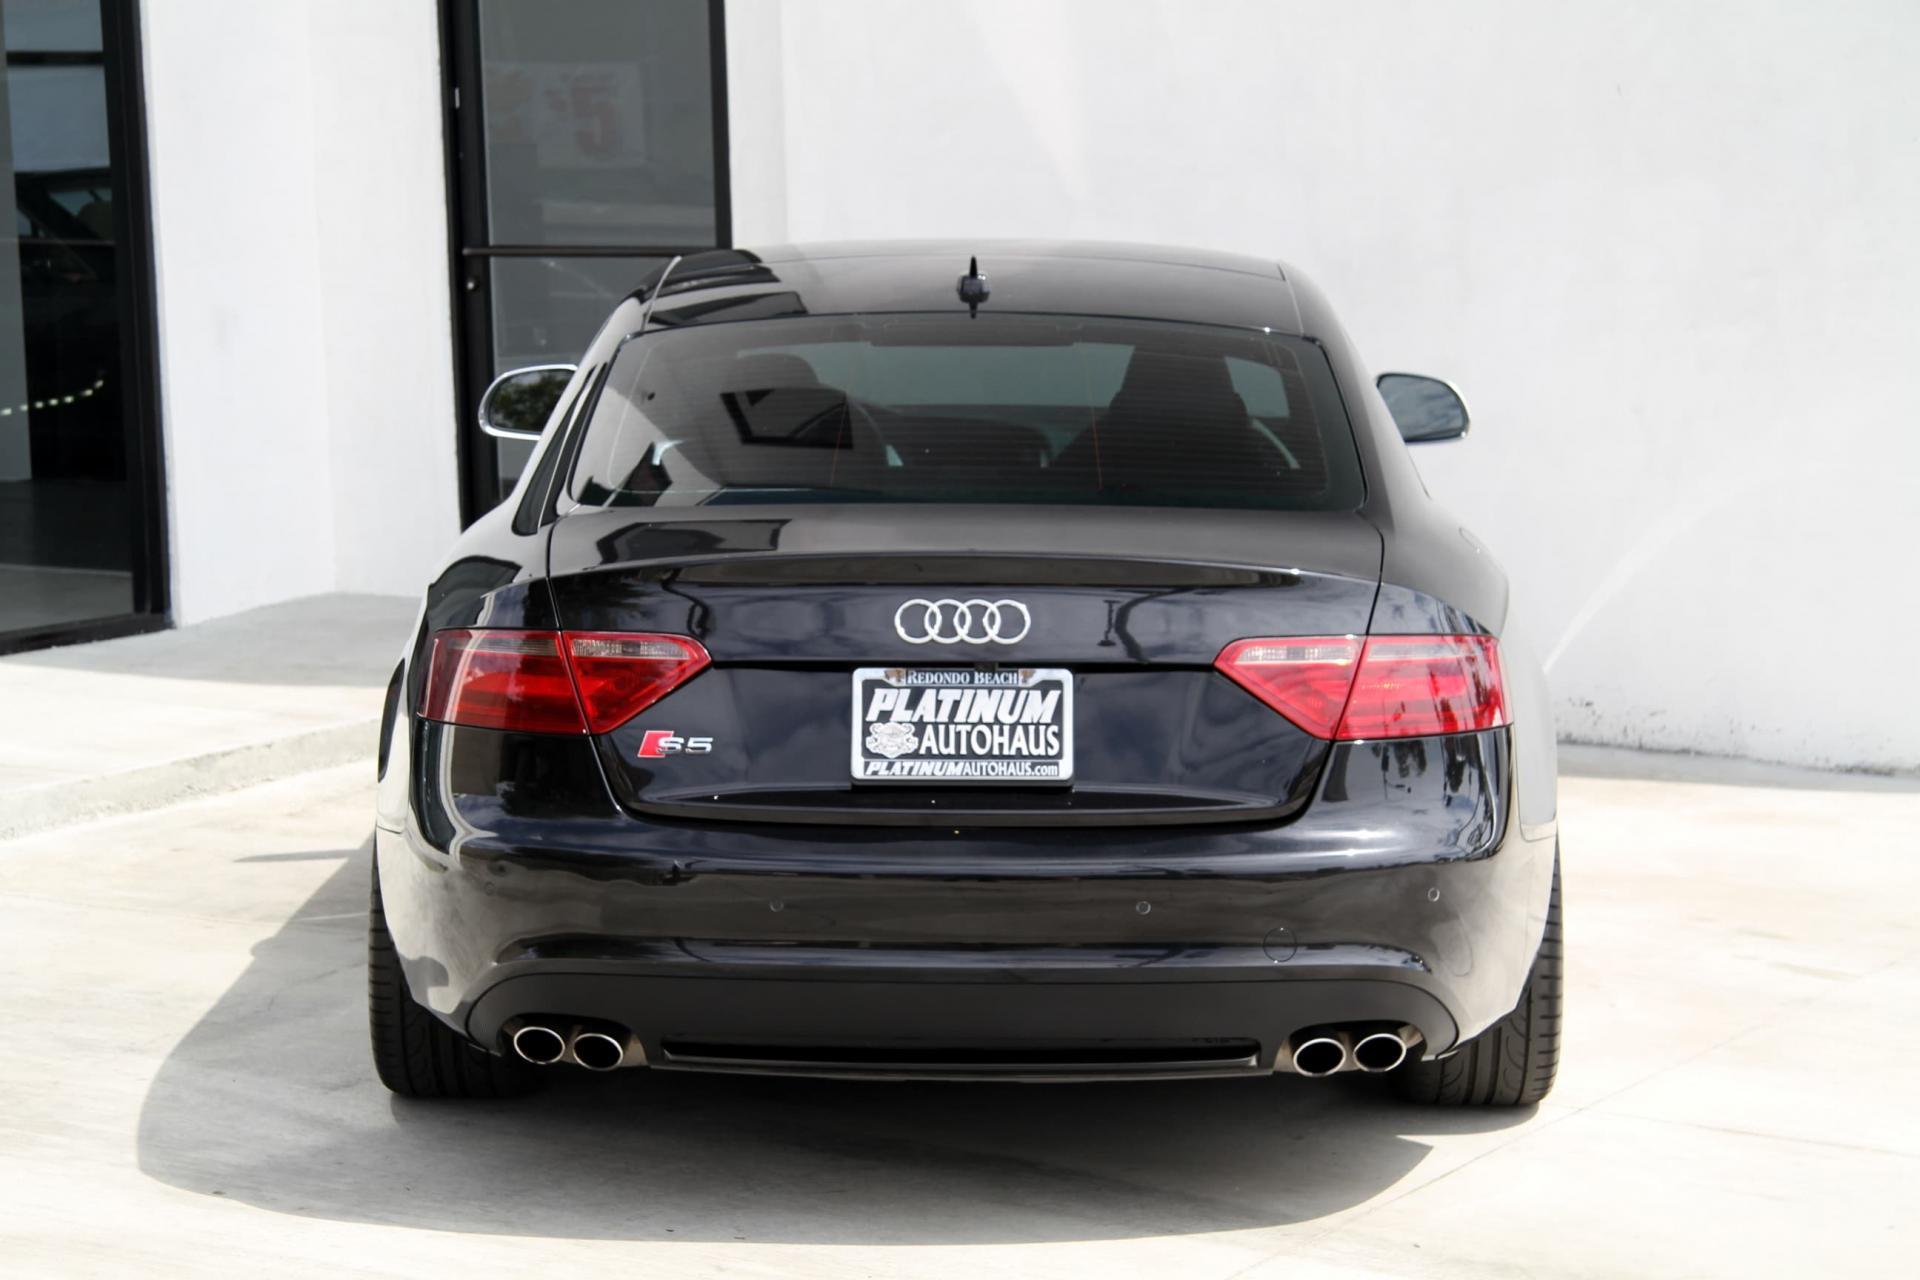 Audi Near Me >> 2009 Audi S5 4.2L Stock # 5910C for sale near Redondo ...